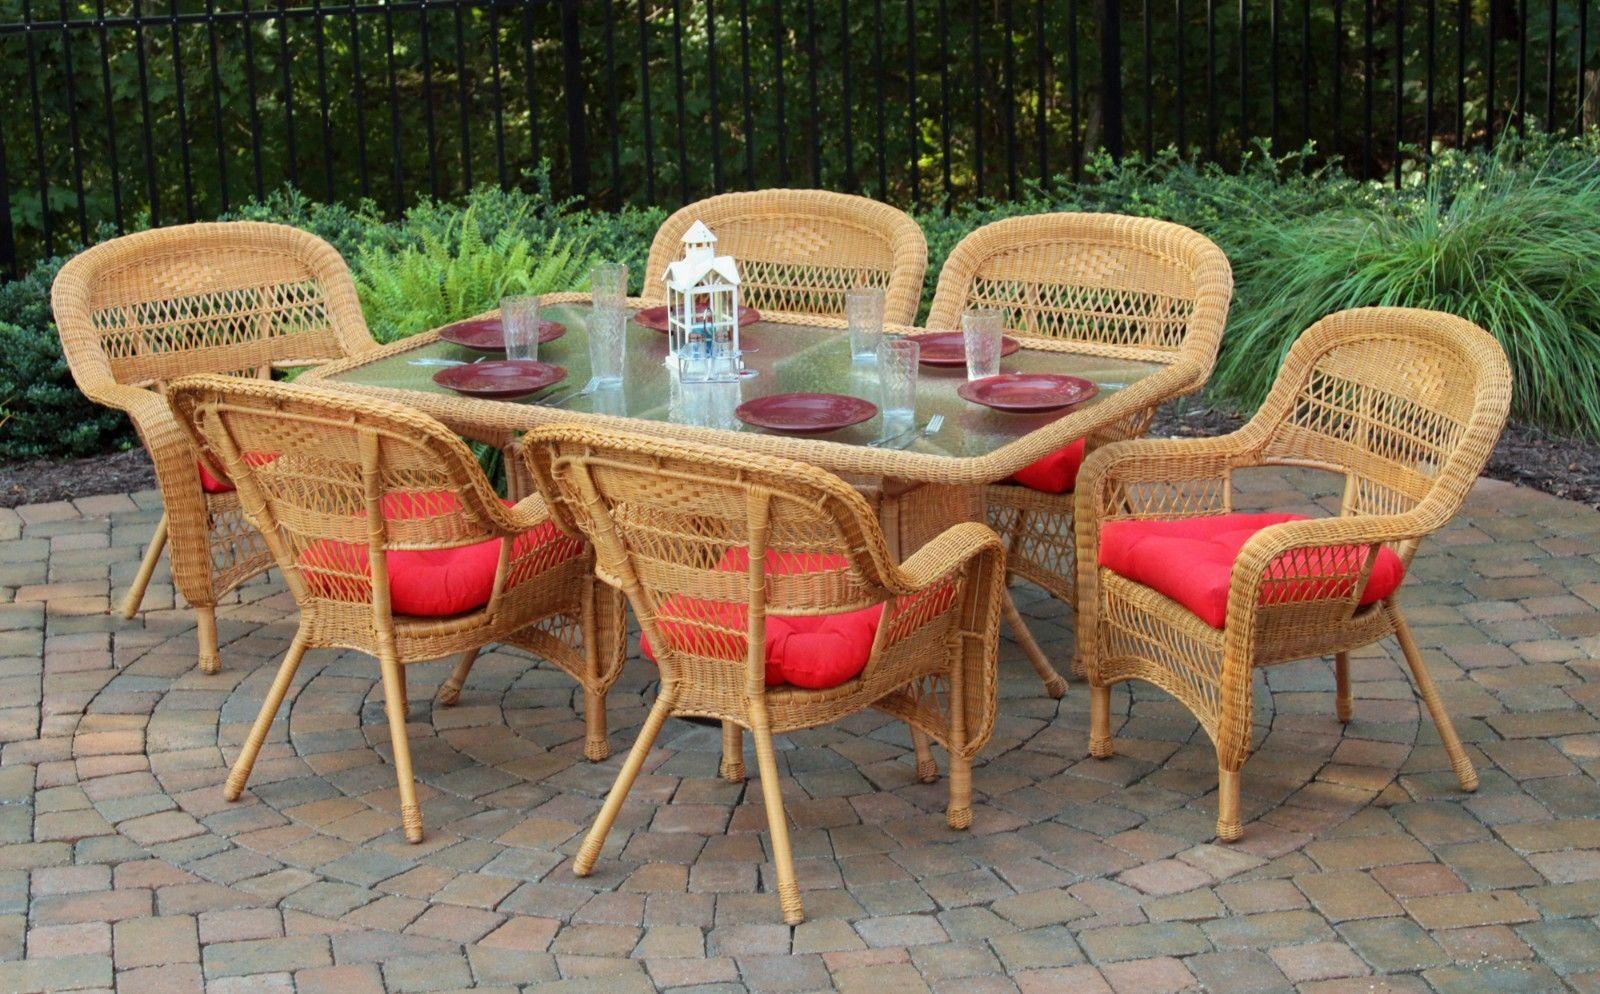 #5 - 7 Pcs Outdoor Patio Dining Set w/ Southwest Amber Resin Wicker & Monti Pompeii